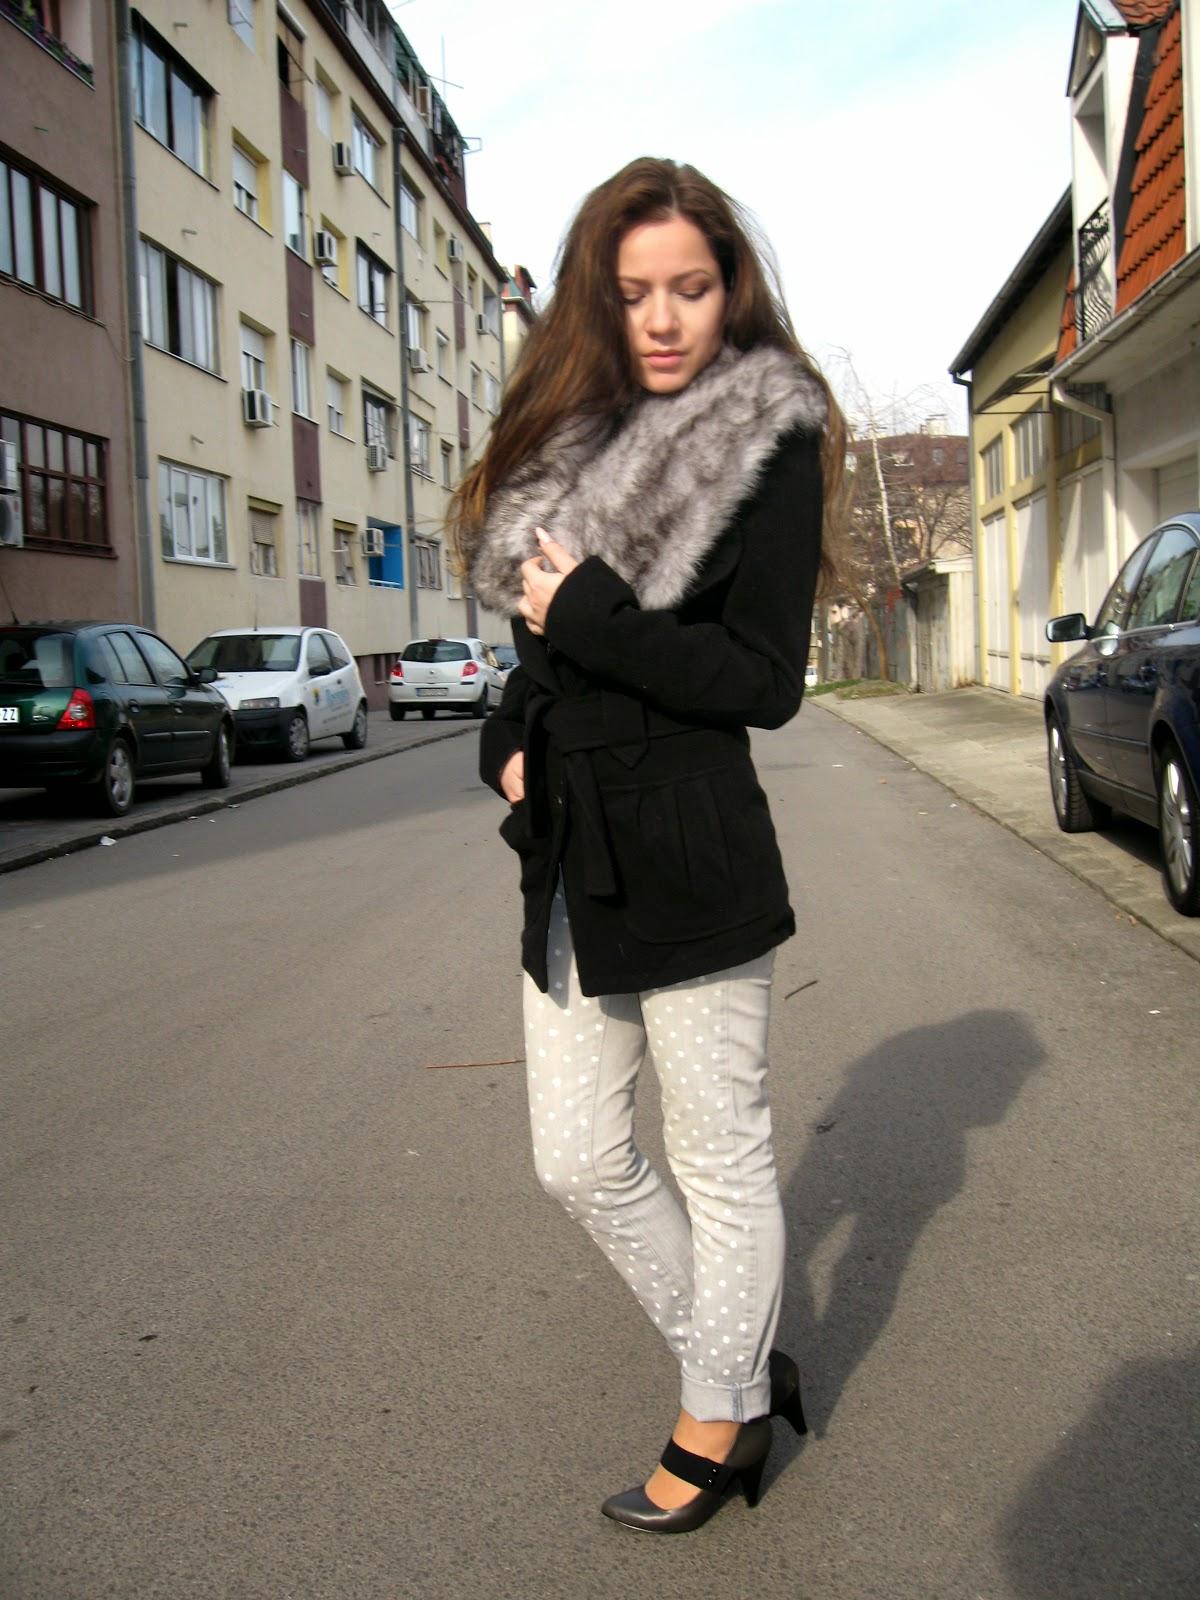 outfit, grey jeans with polka dots, black coat, grey faux fur collar, zara shoes, zara strappy heels, zara pointed heels